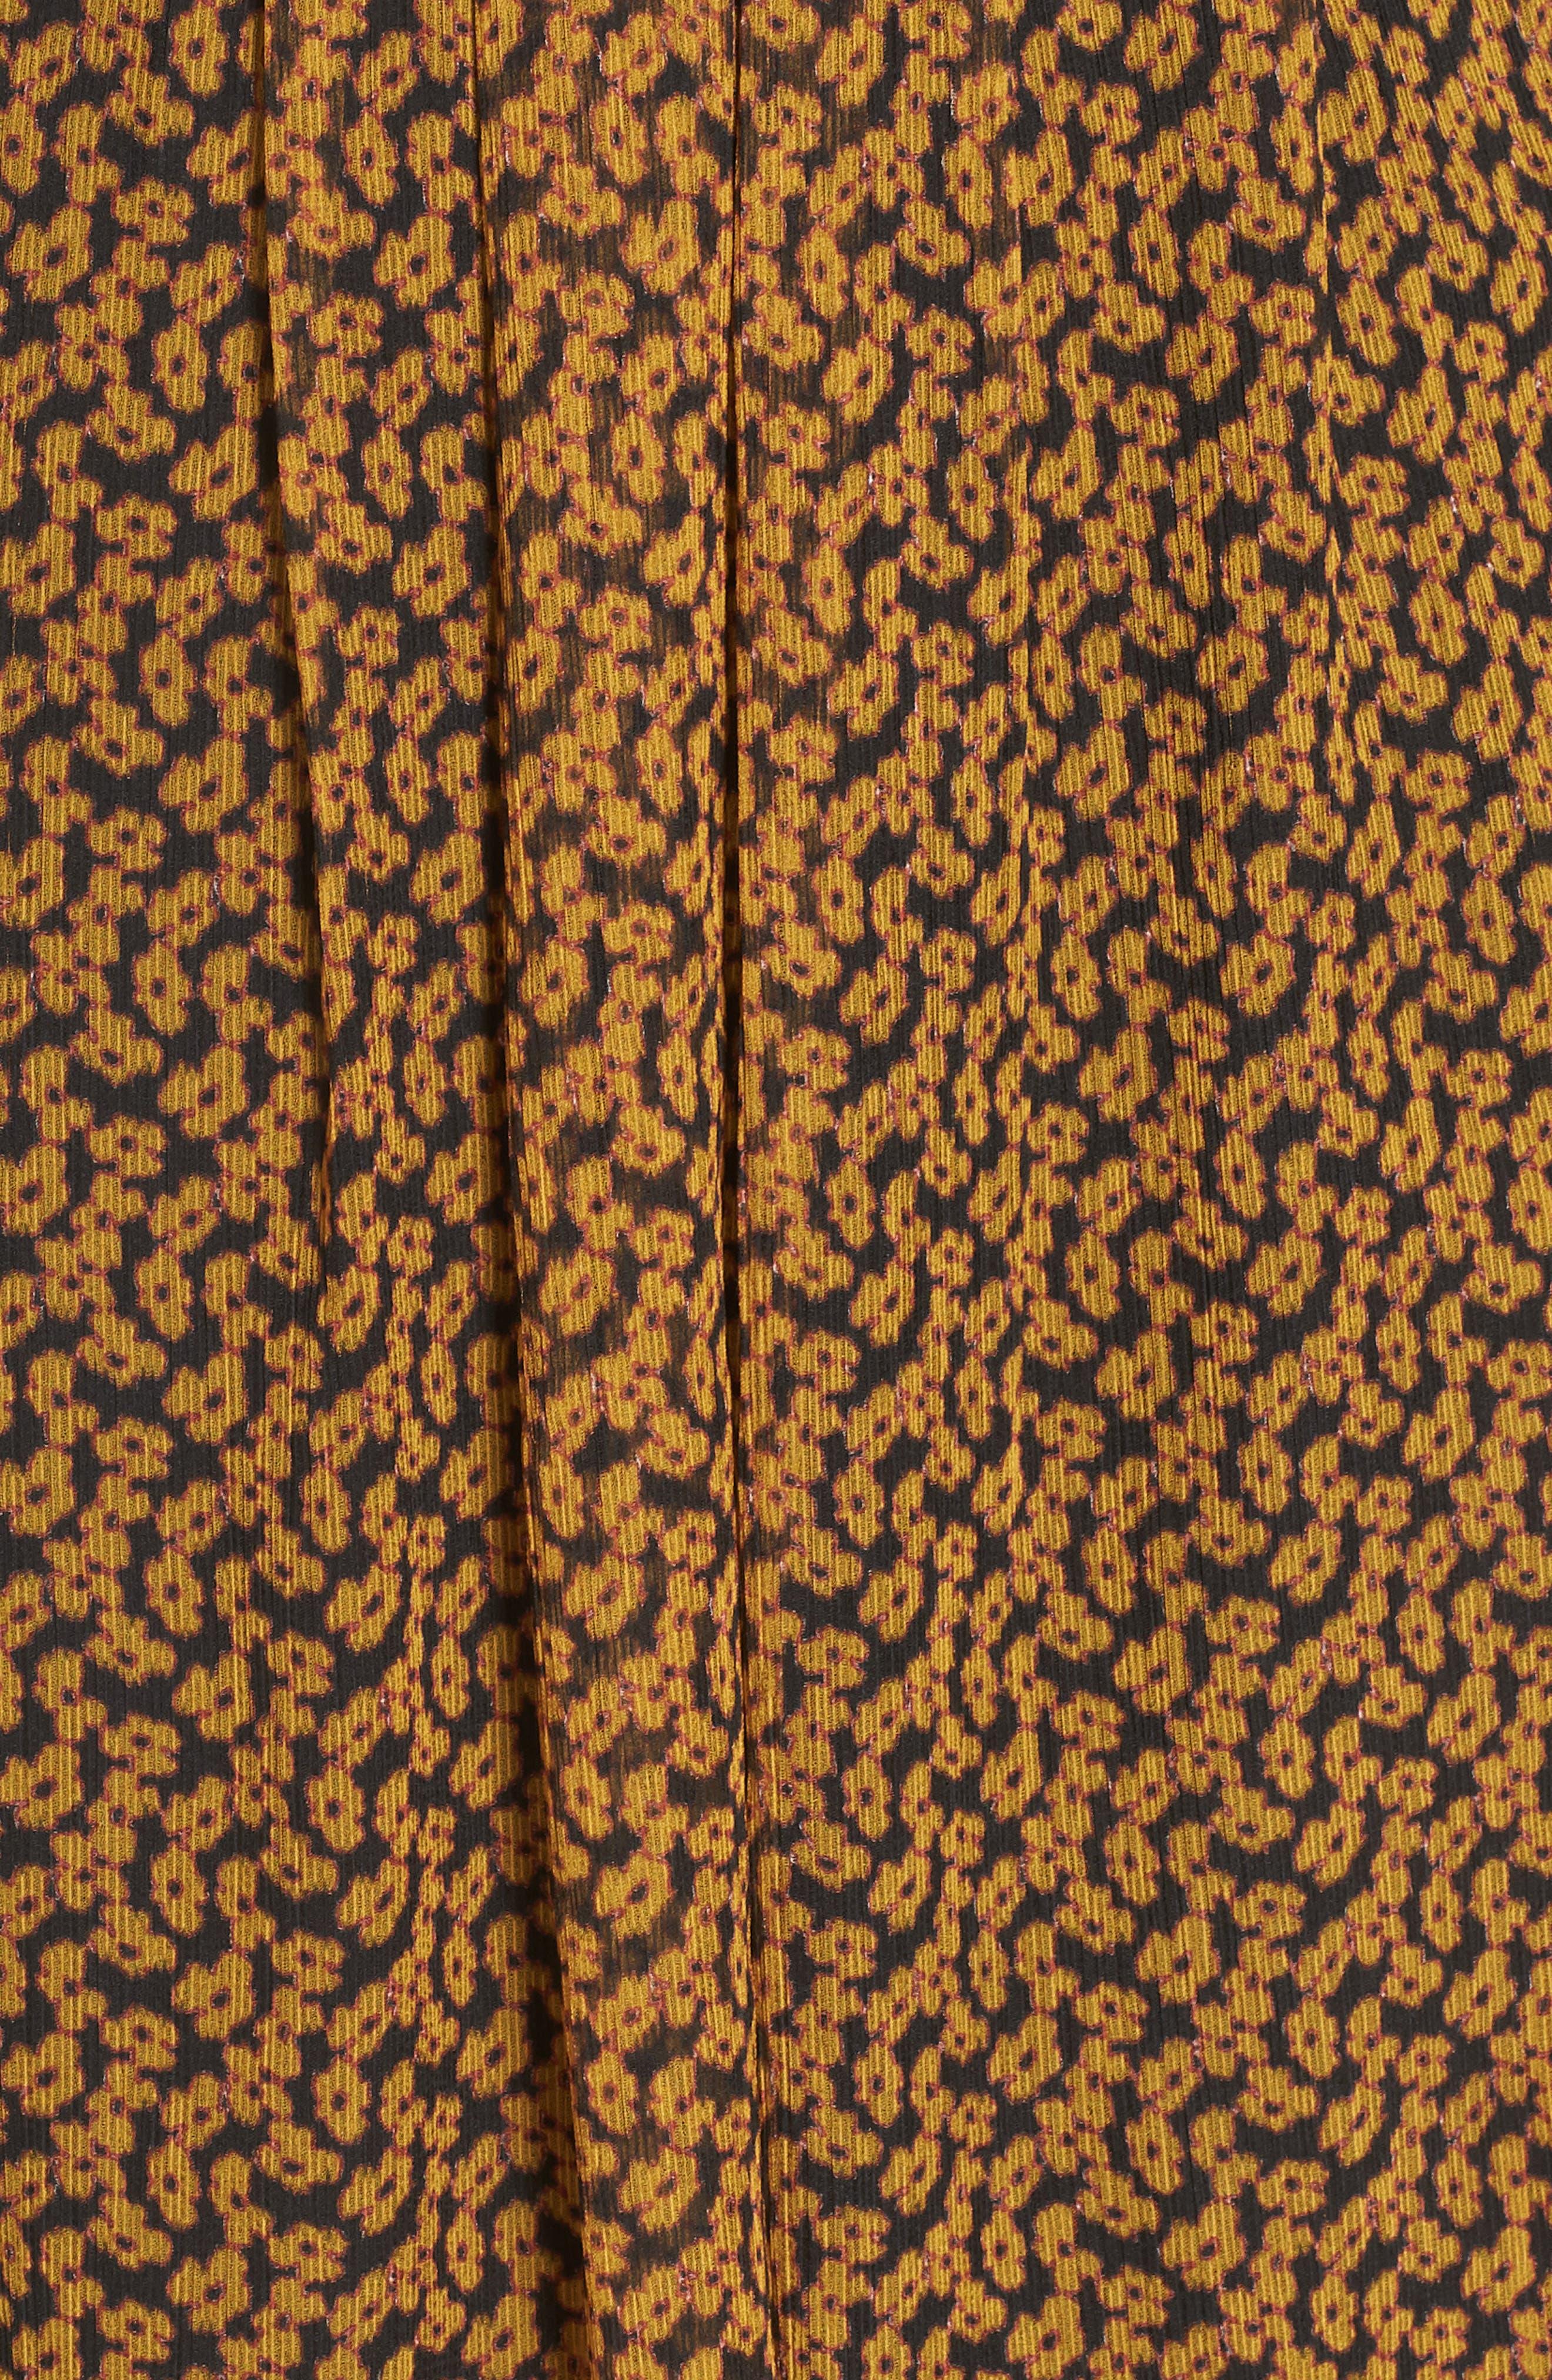 Floral Print Side Slit Midi Dress,                             Alternate thumbnail 6, color,                             MARIGOLD